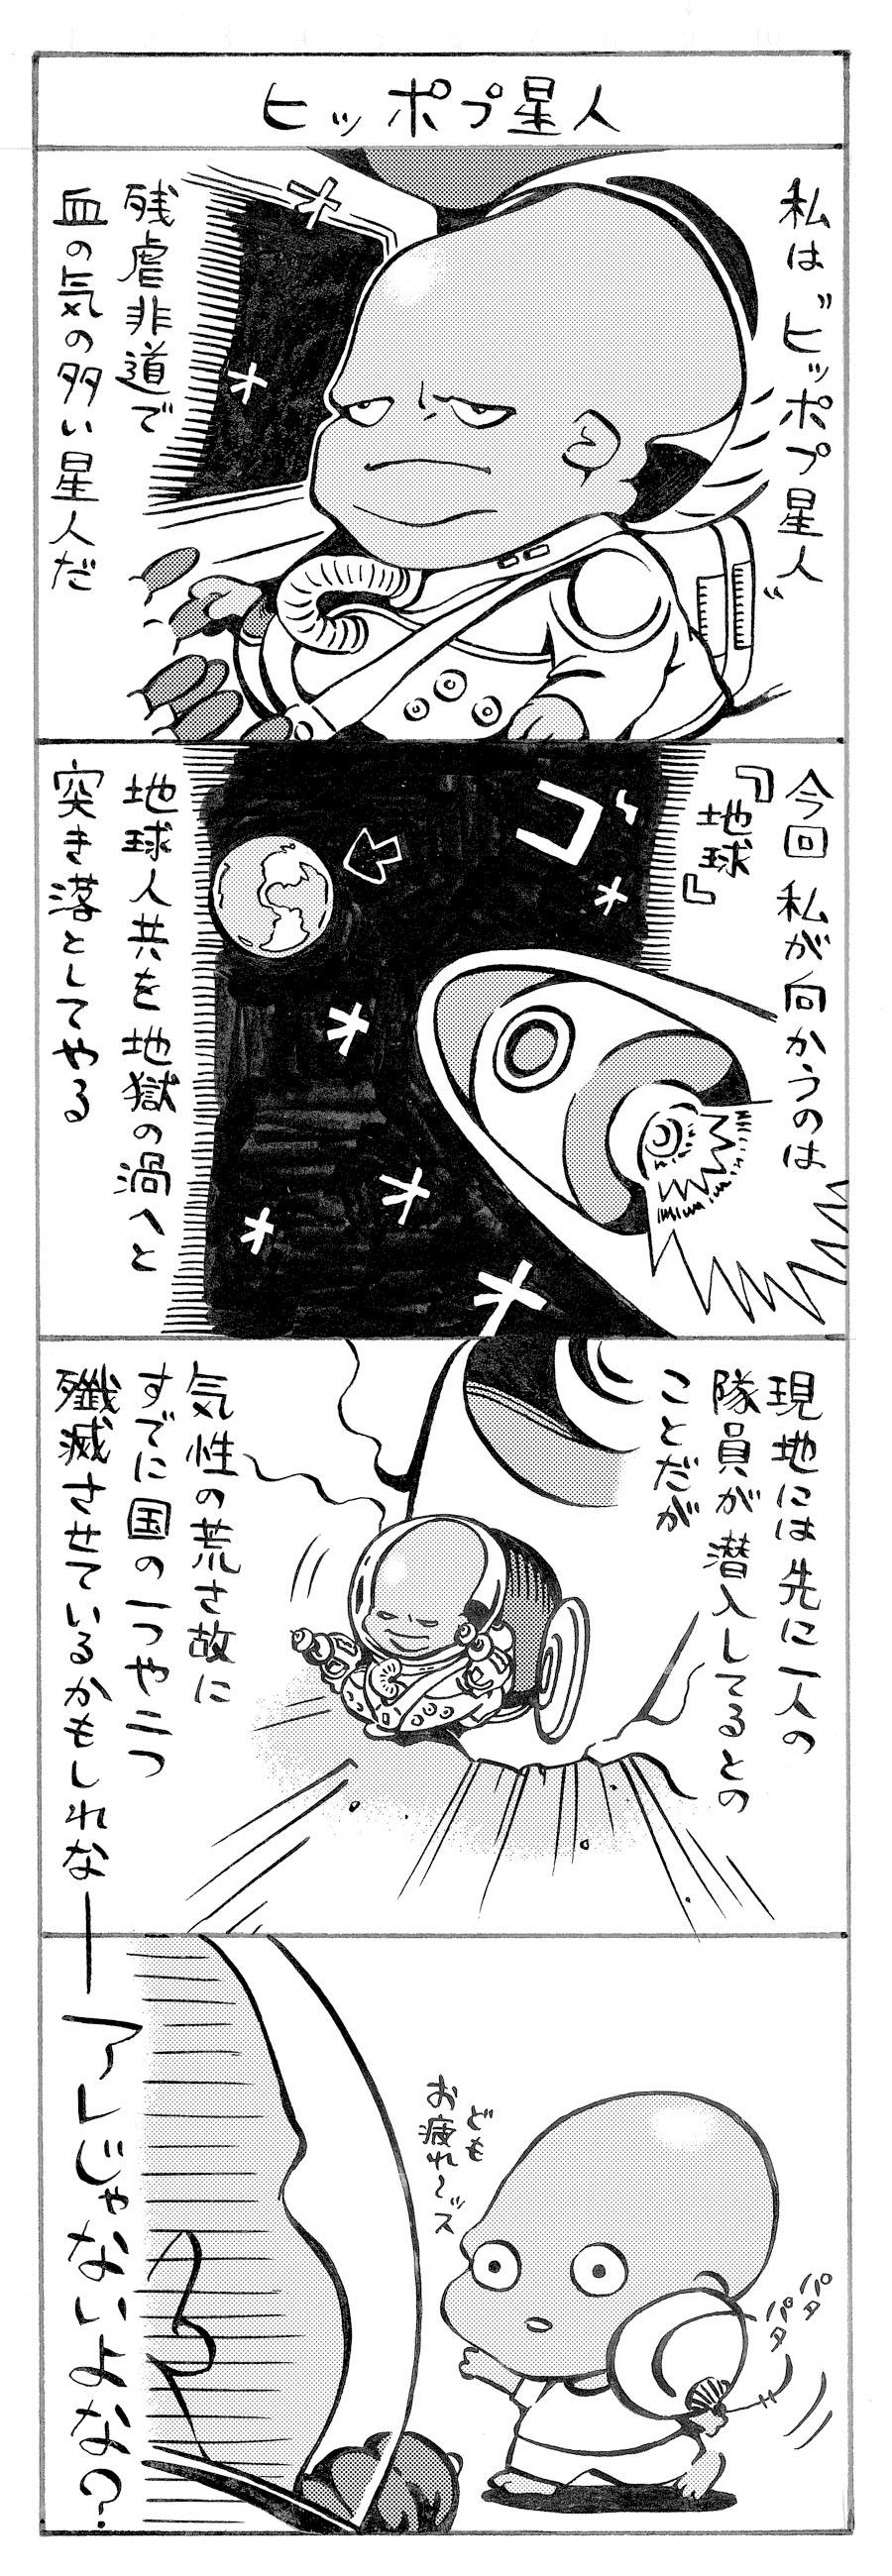 hippseijin_manga_01